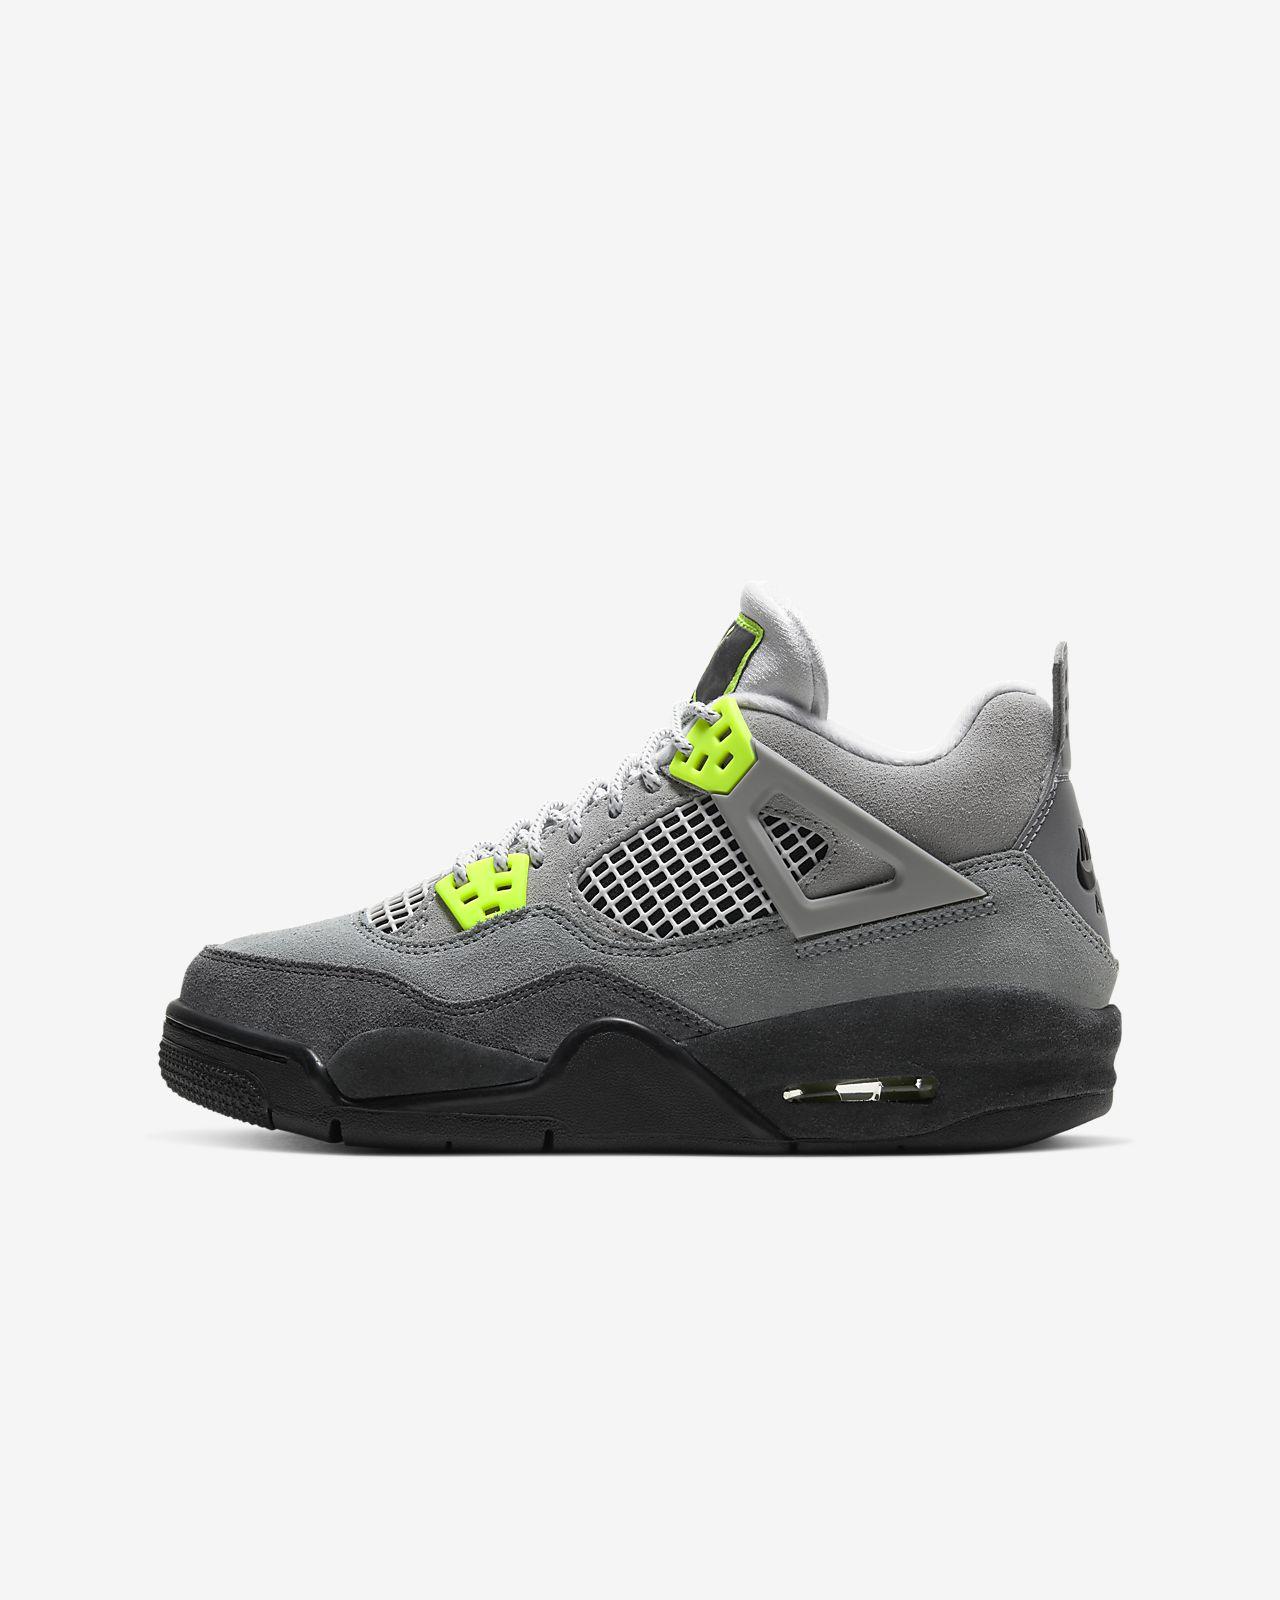 Air Jordan IV Schuh